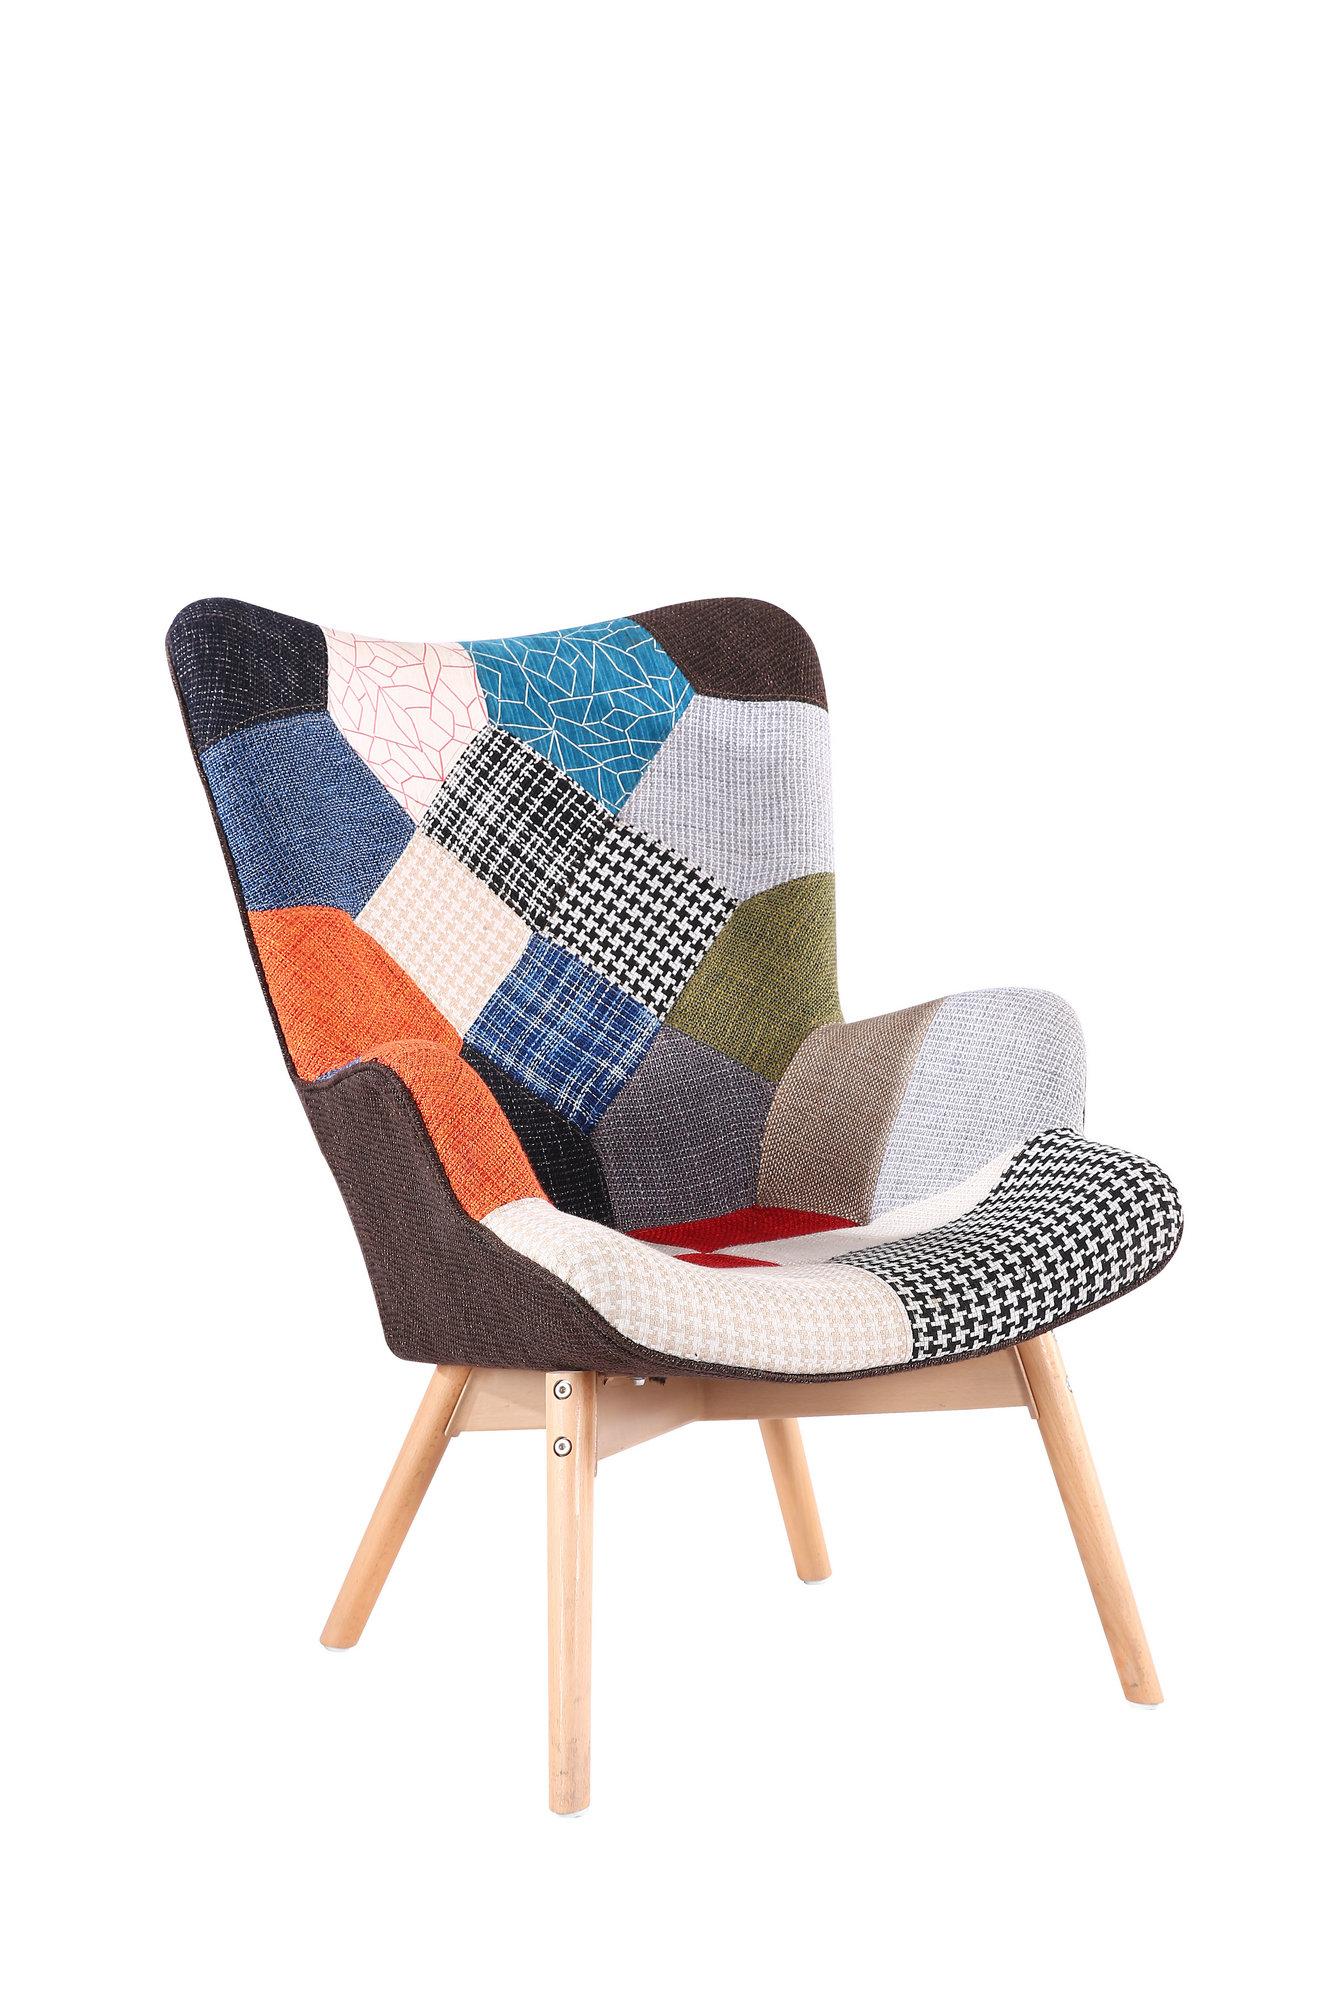 DCE-601B Leisure Chair